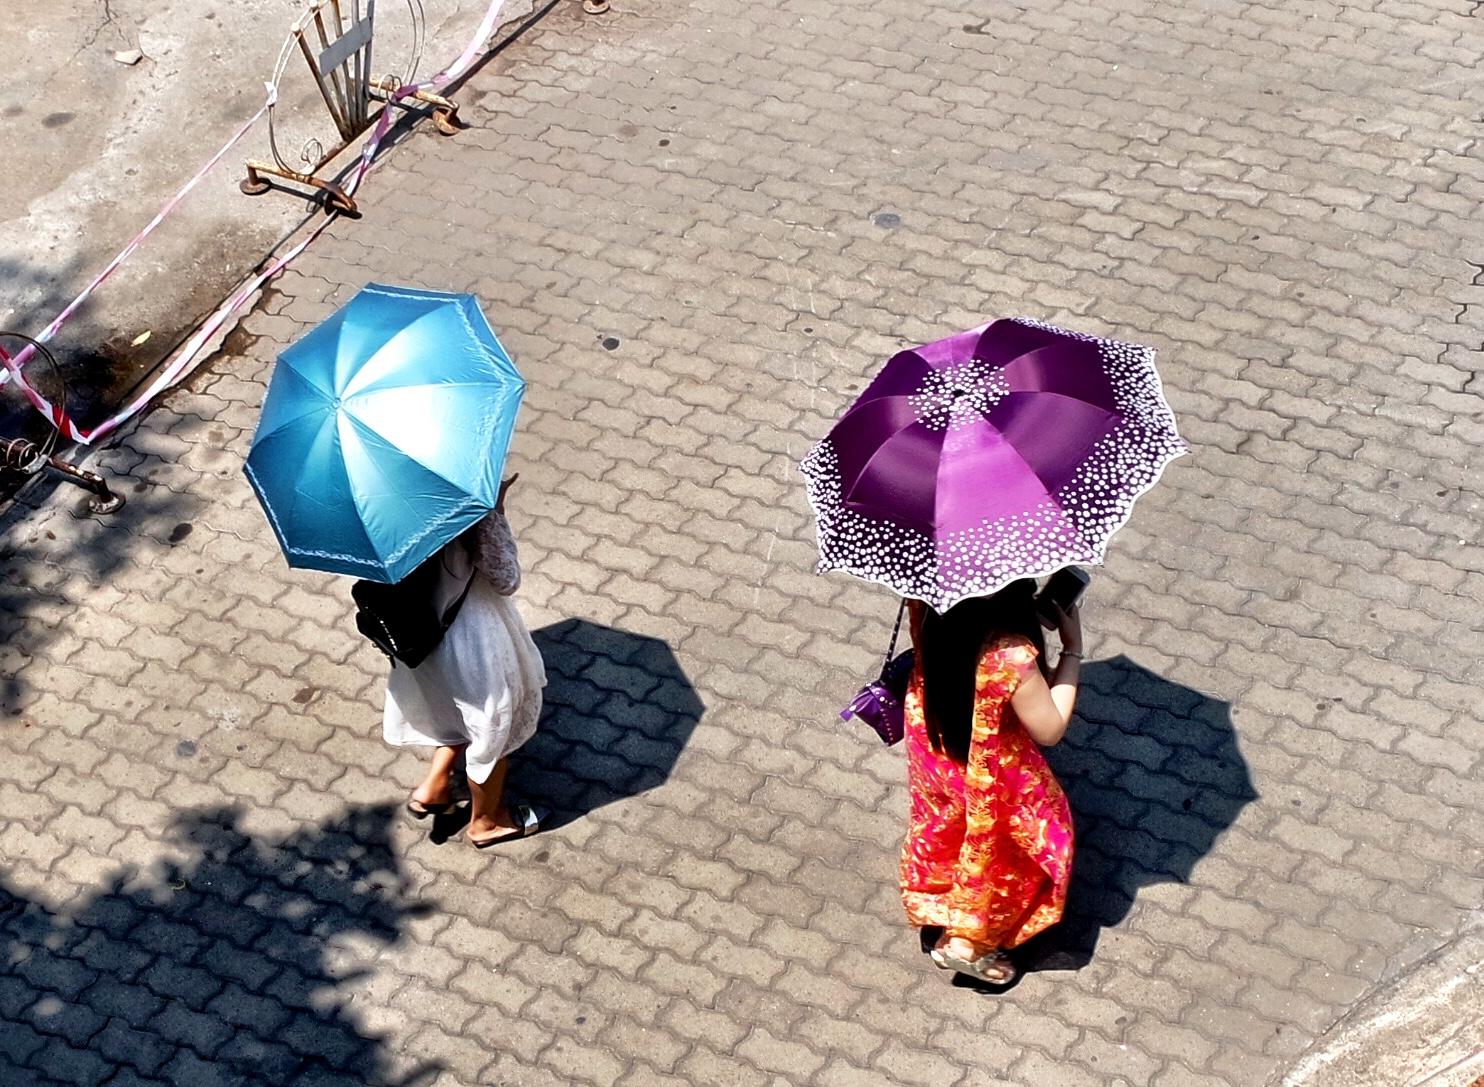 bupphramumbrellas.jpeg